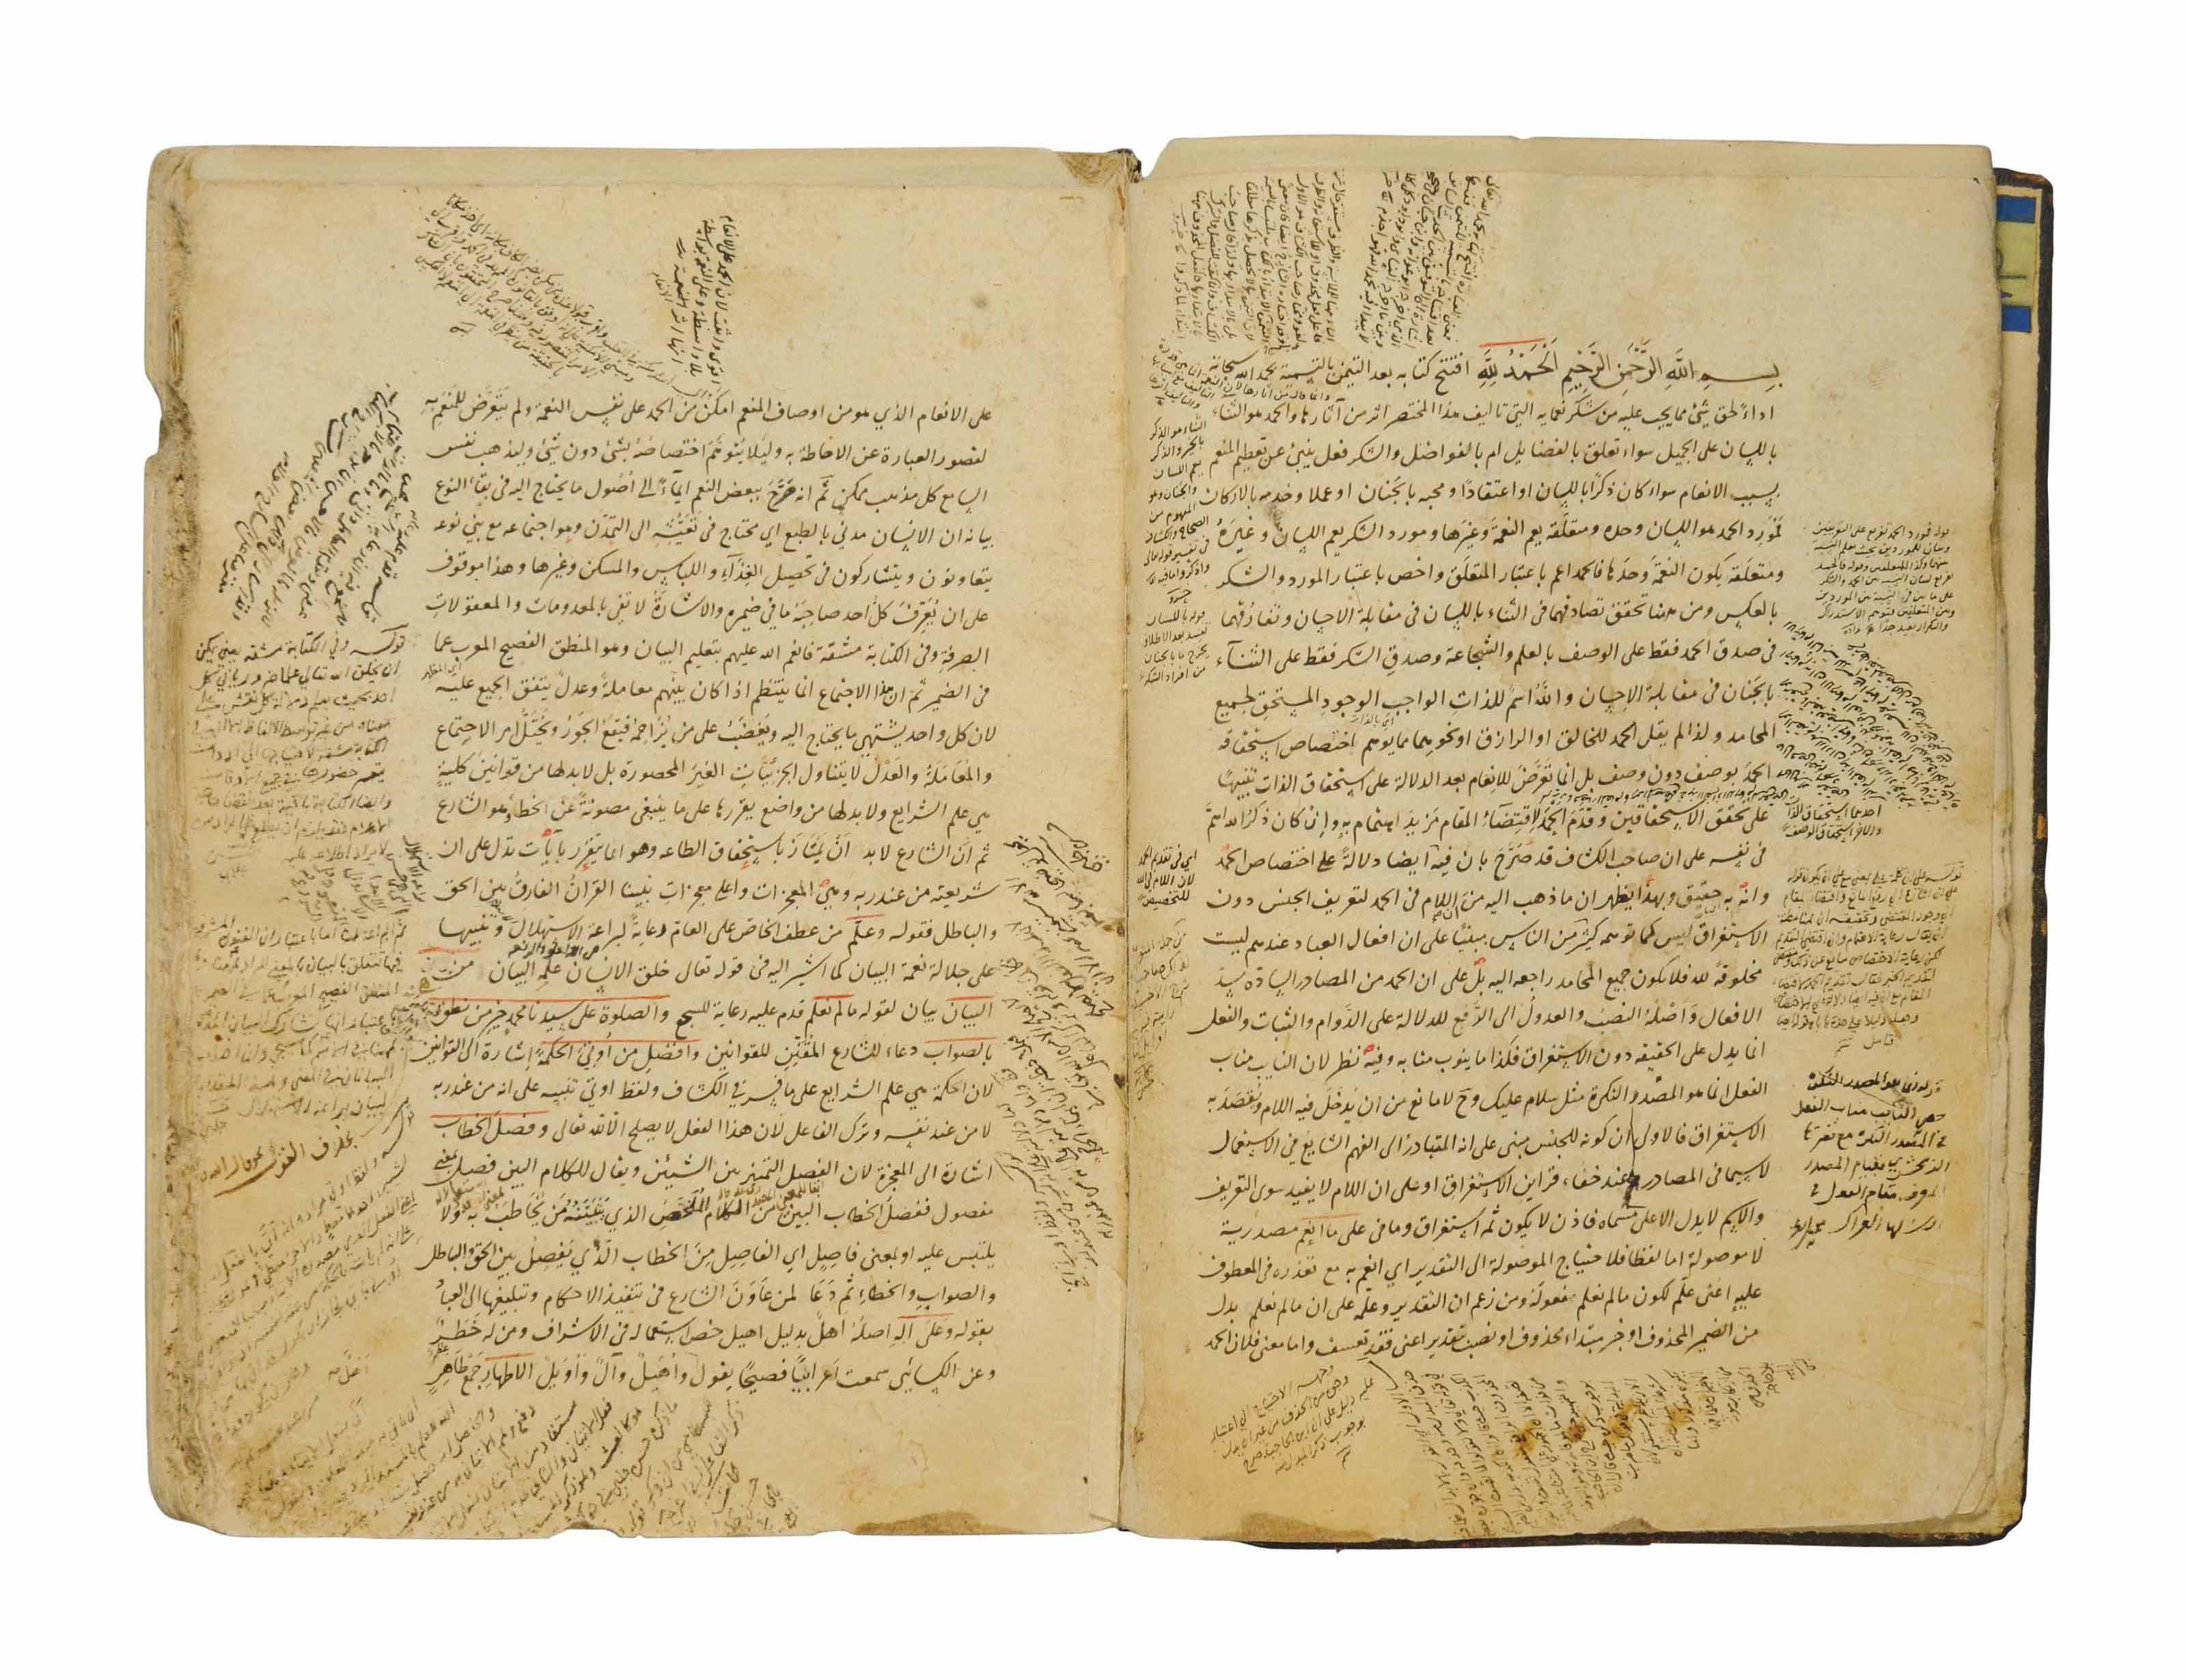 SHARH KITAB TALKHIS AL-MIFTAH